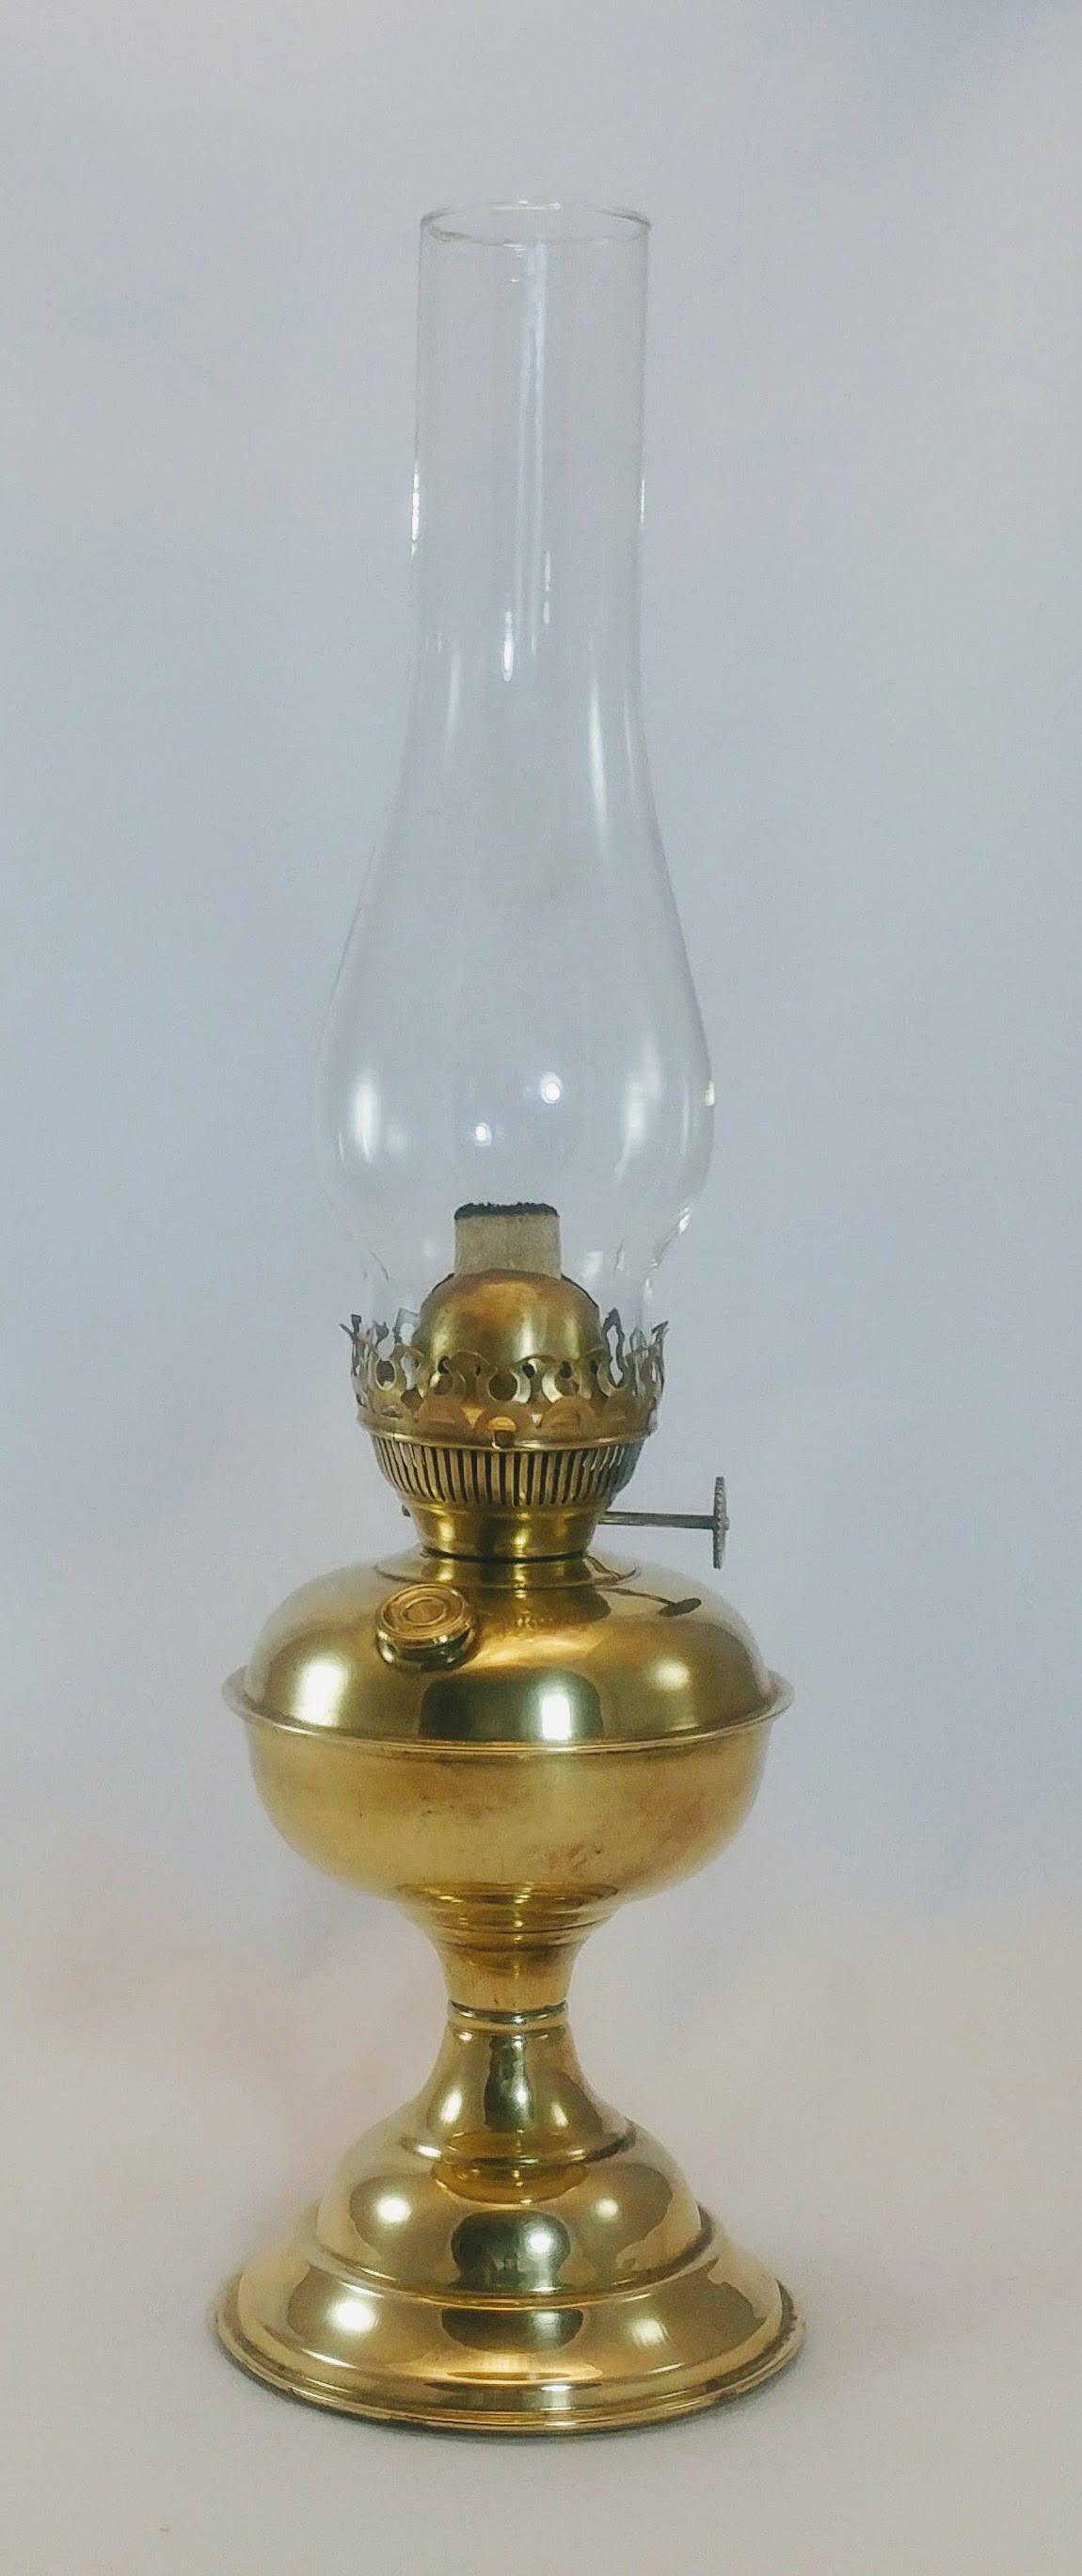 India Brass Antique Brass Oil Lamp Hurricane Oil Lamp